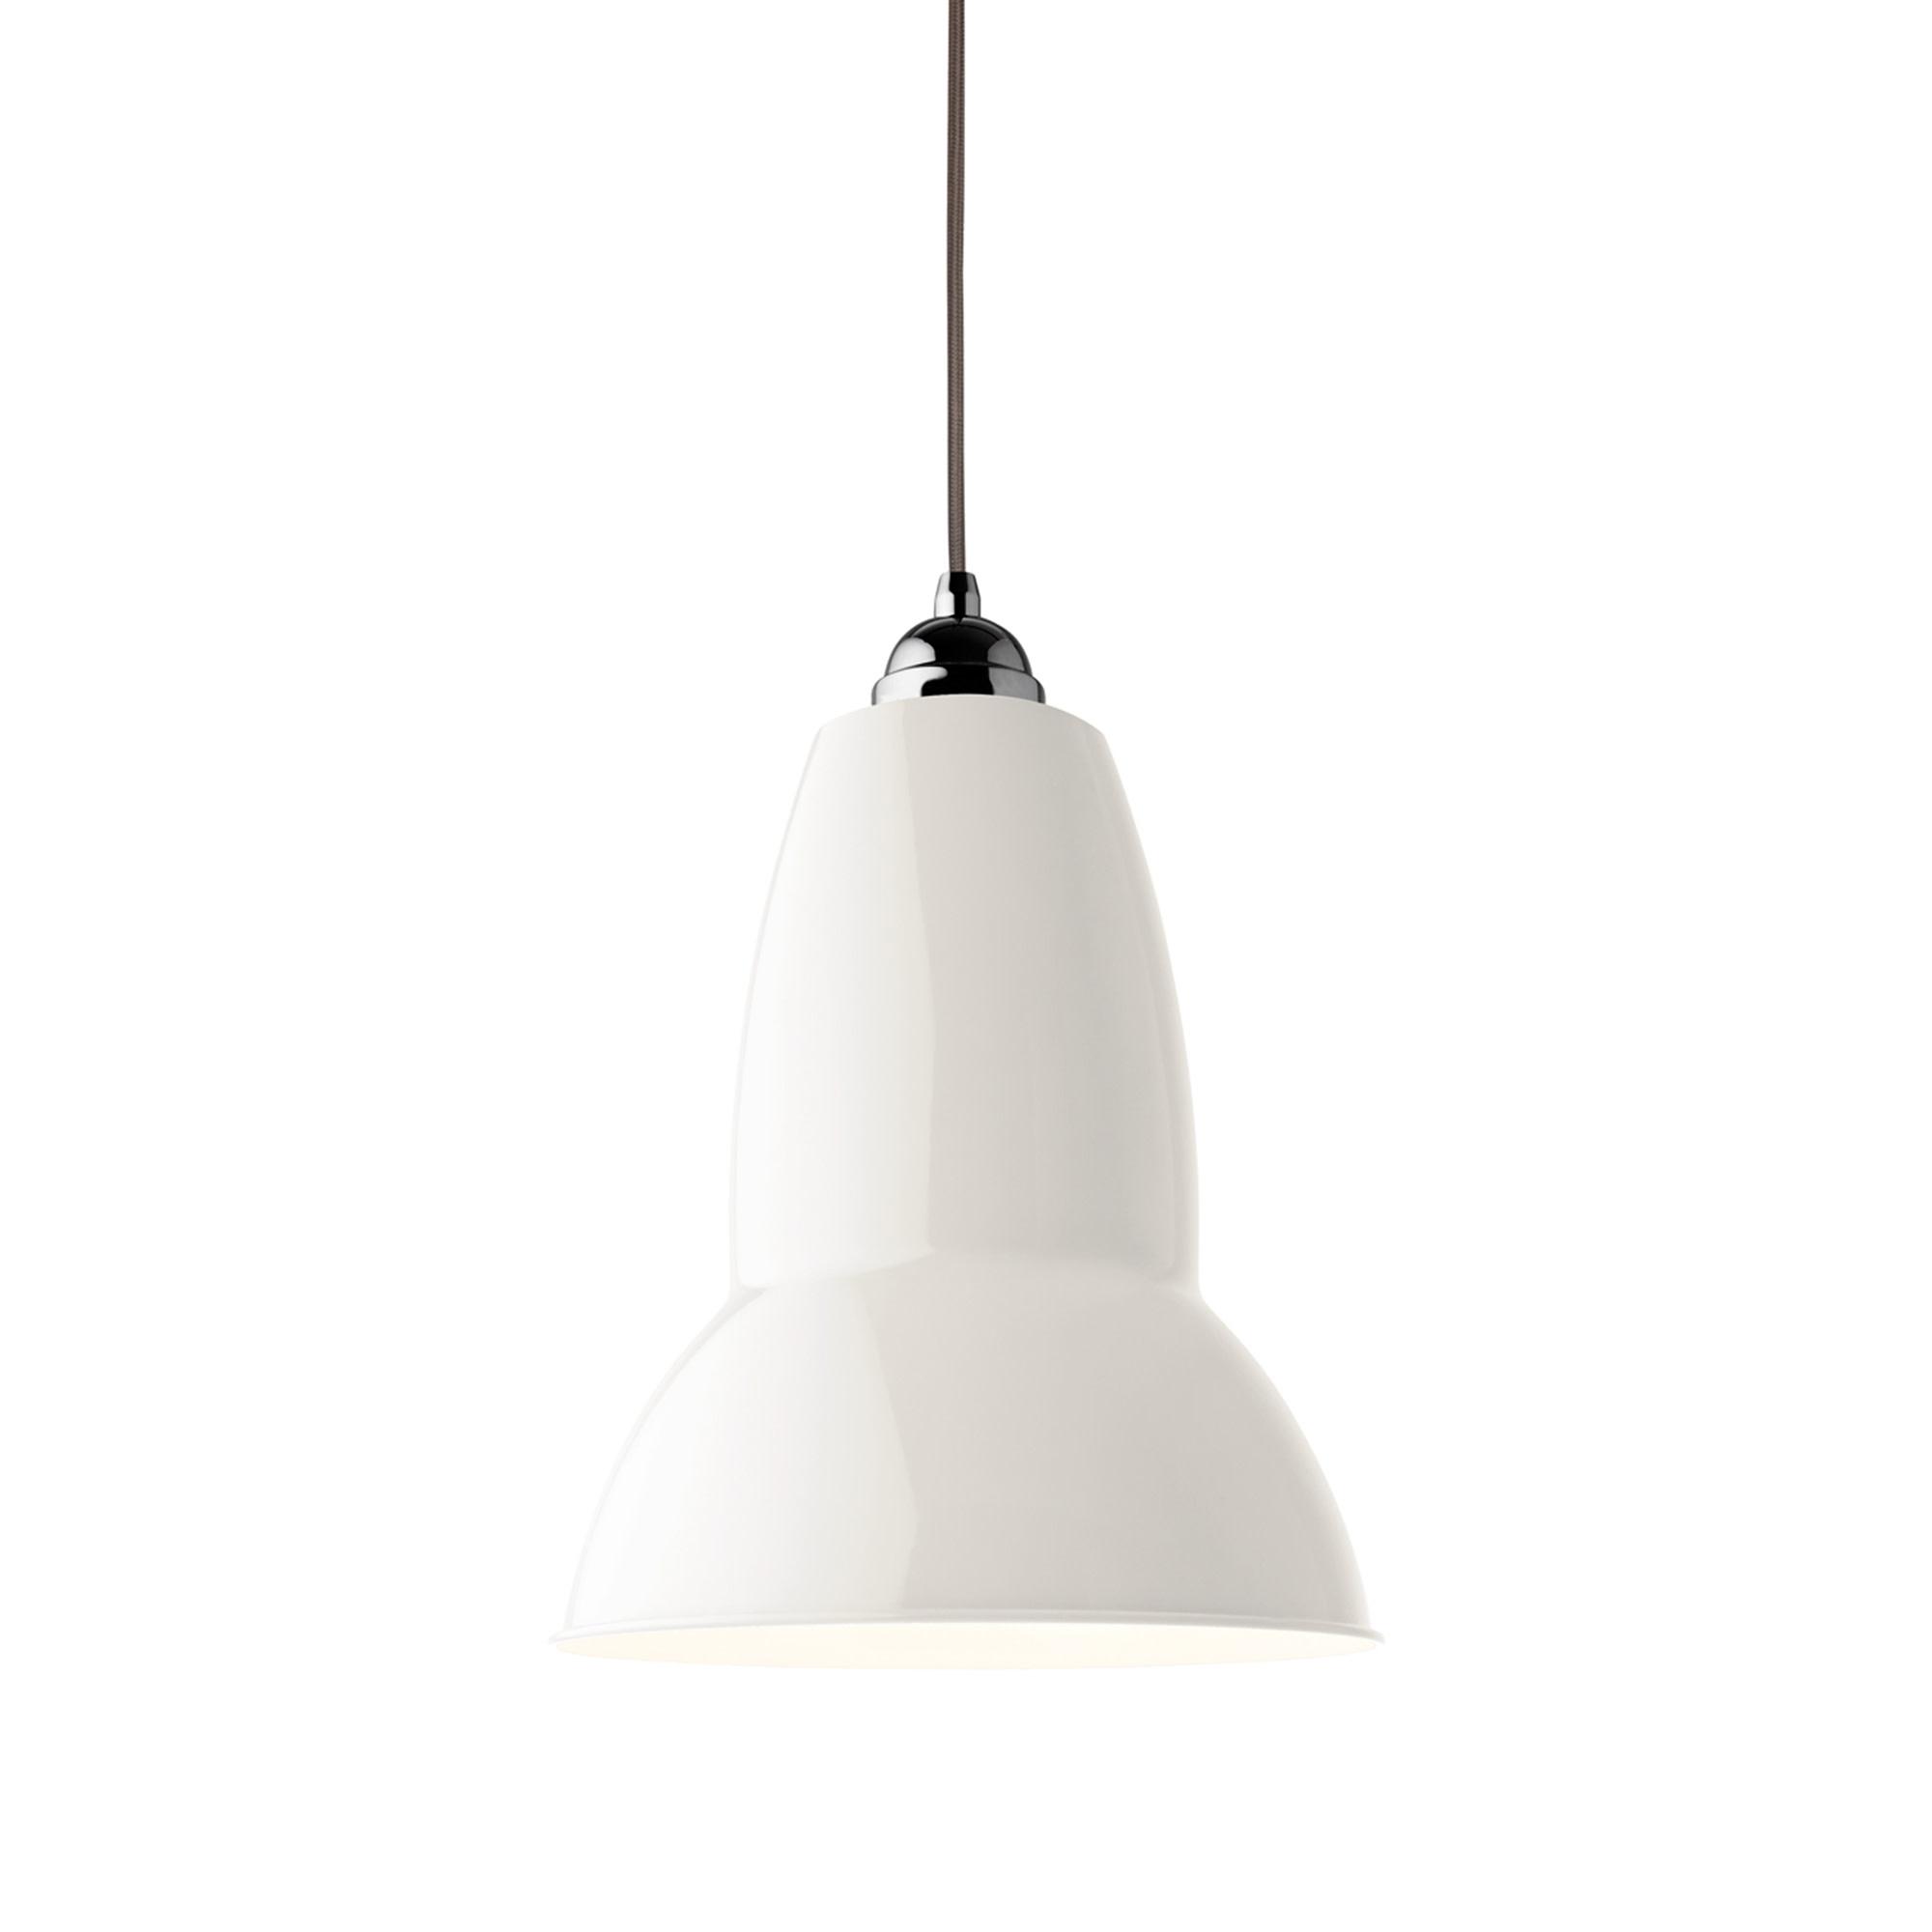 Anglepoise PREORDER Original 1227 Maxi Pendant Lamp - Linen White with Chrome